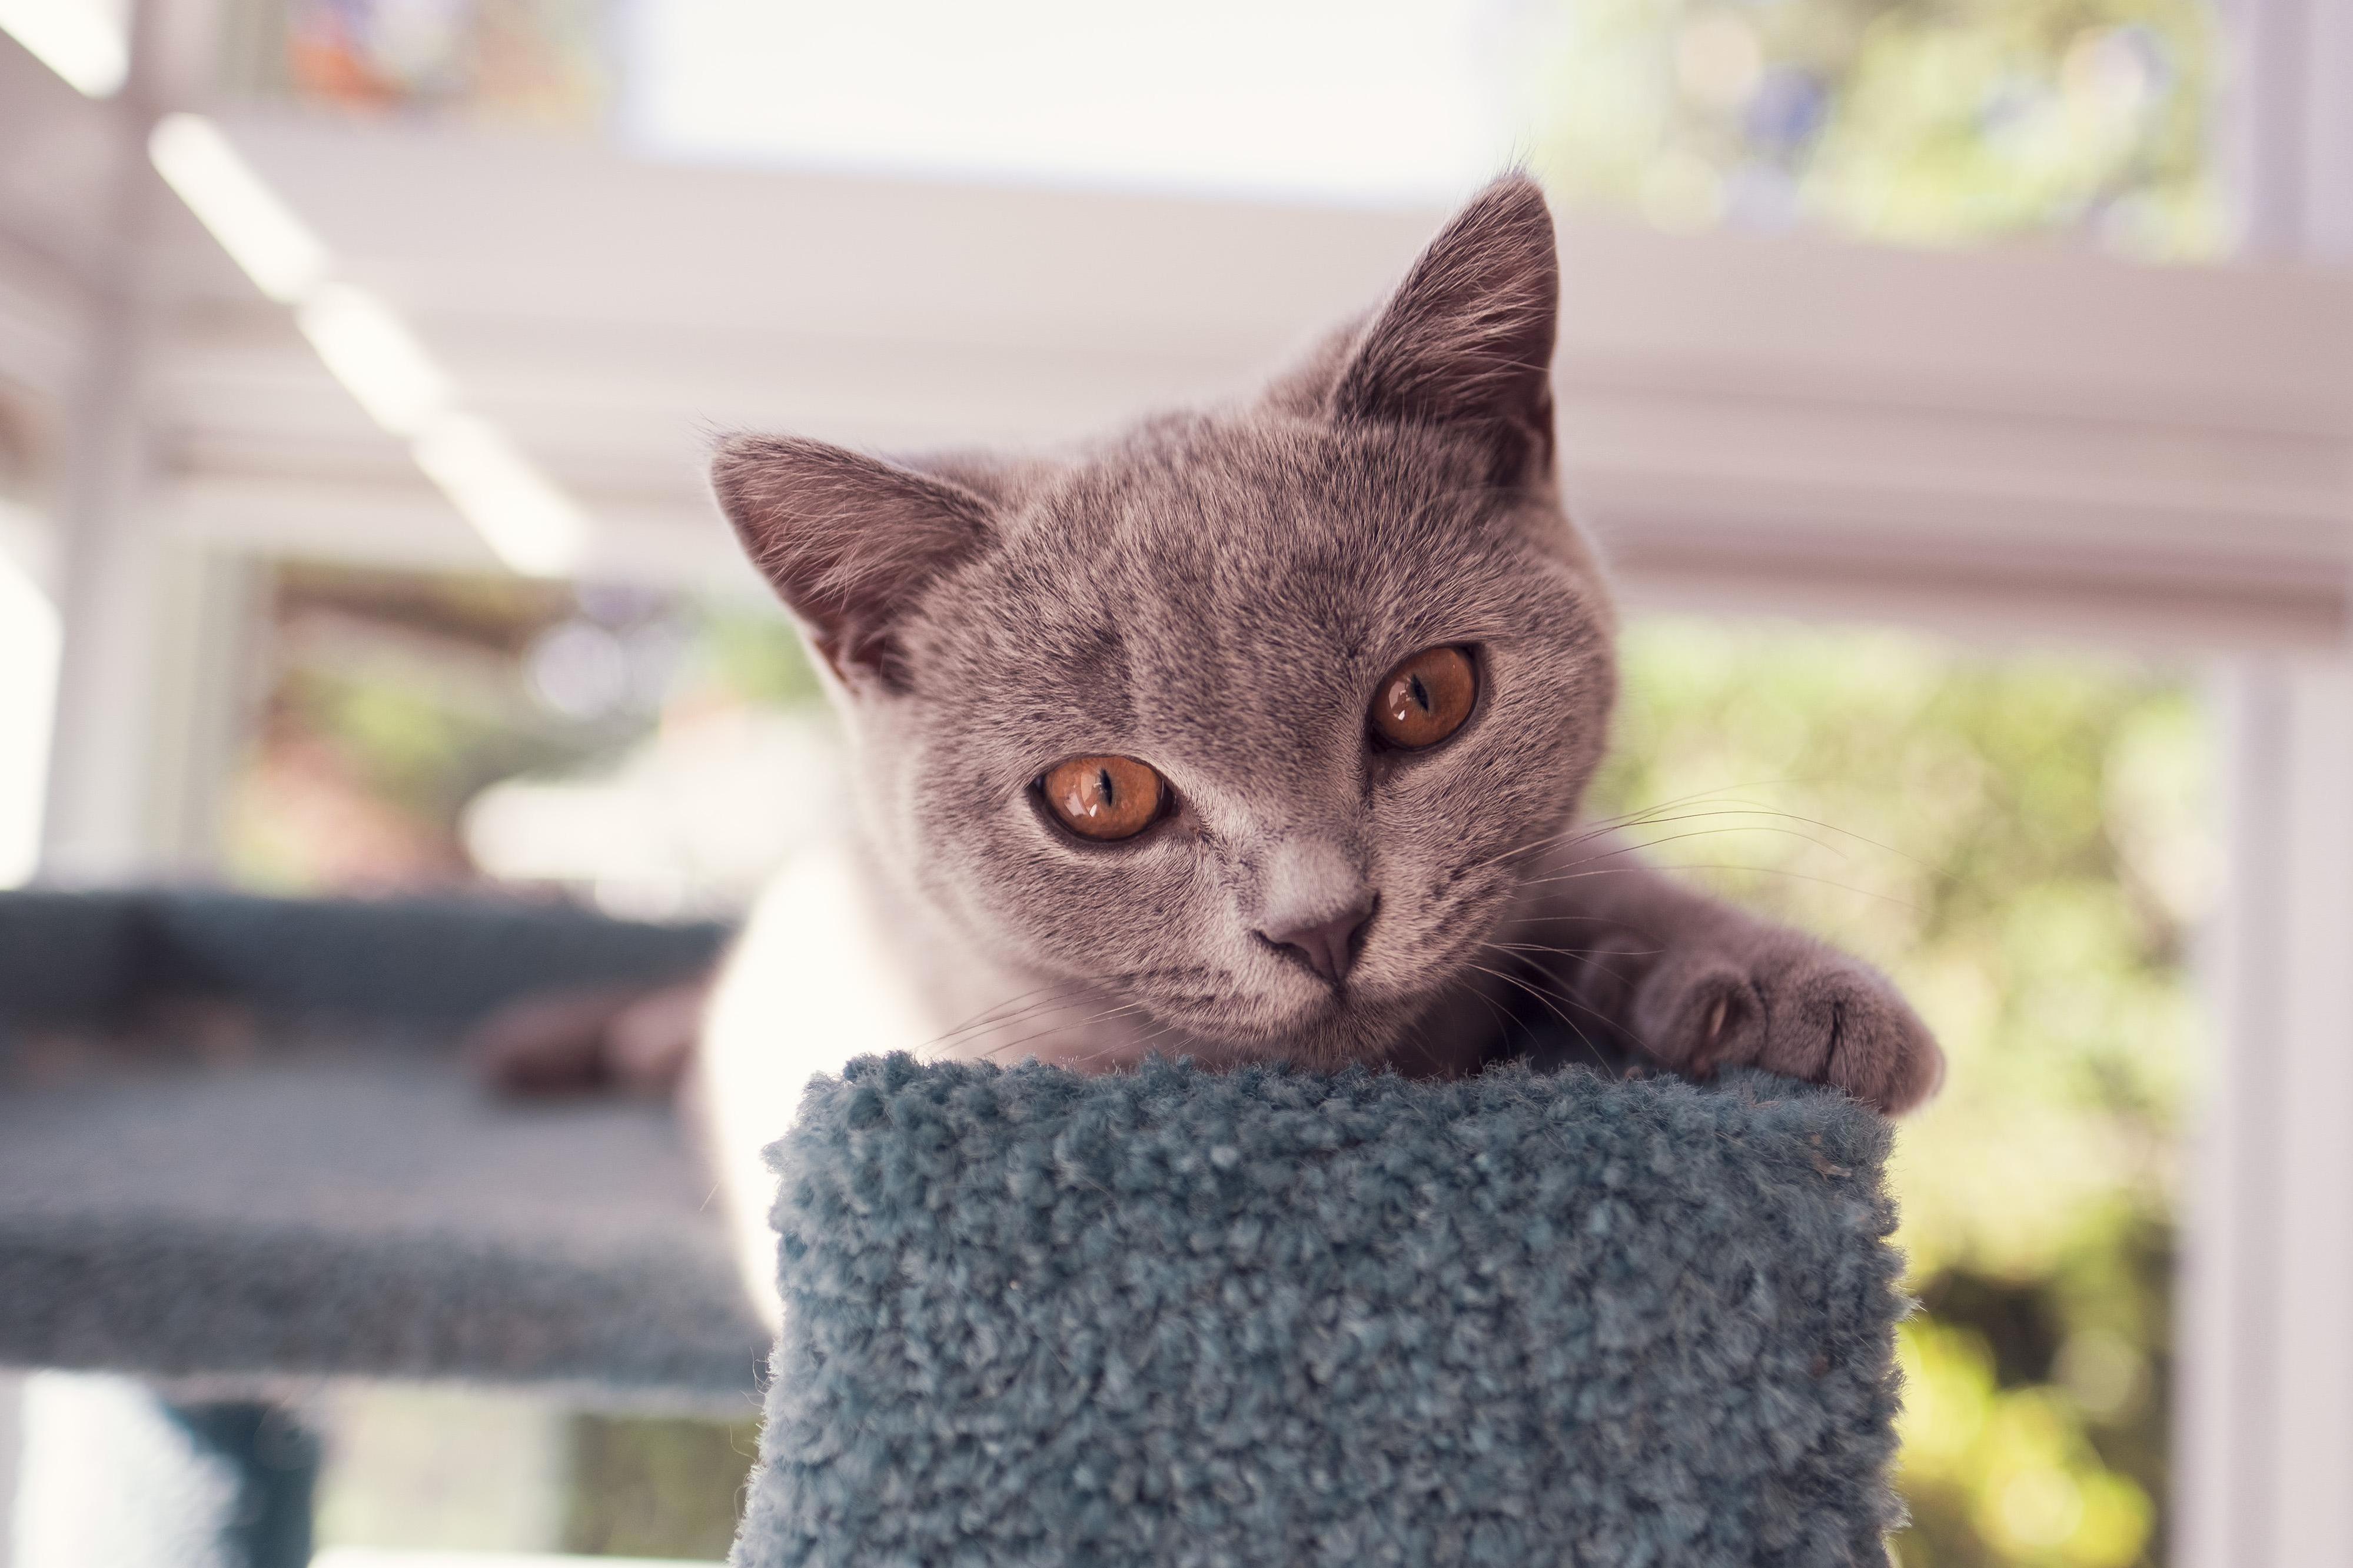 Ozzie on the cat tree